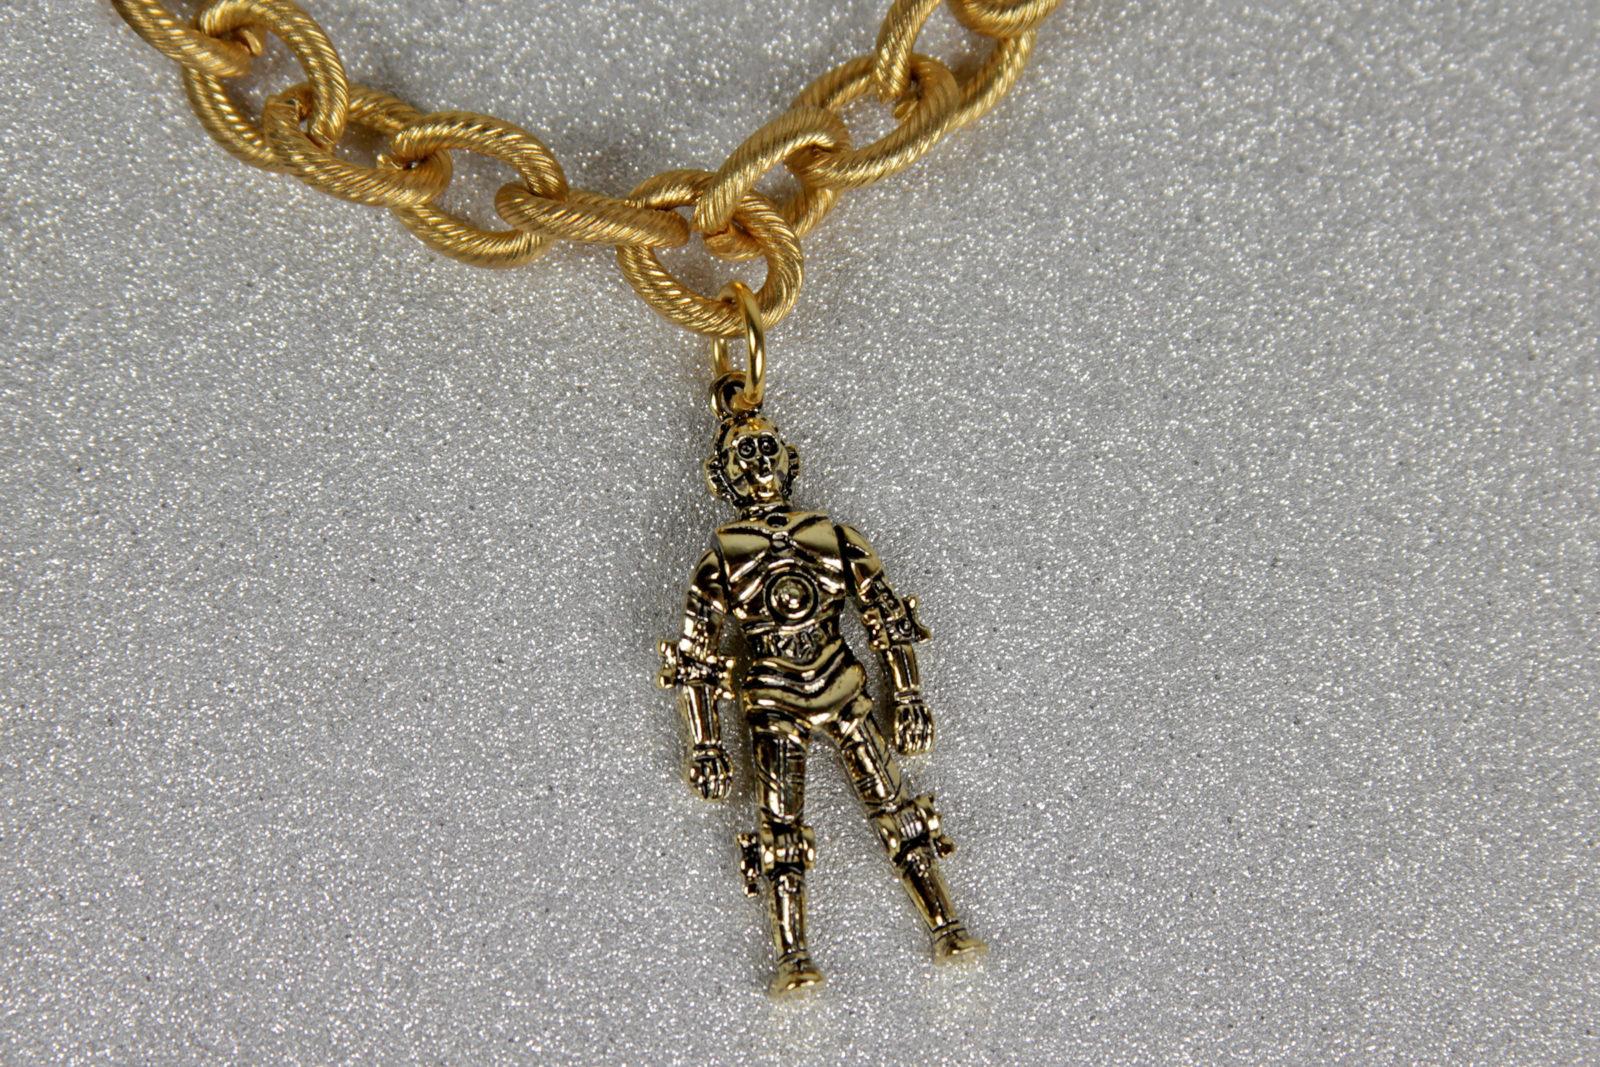 Vintage Star Wars Bracelet - C-3PO Charm